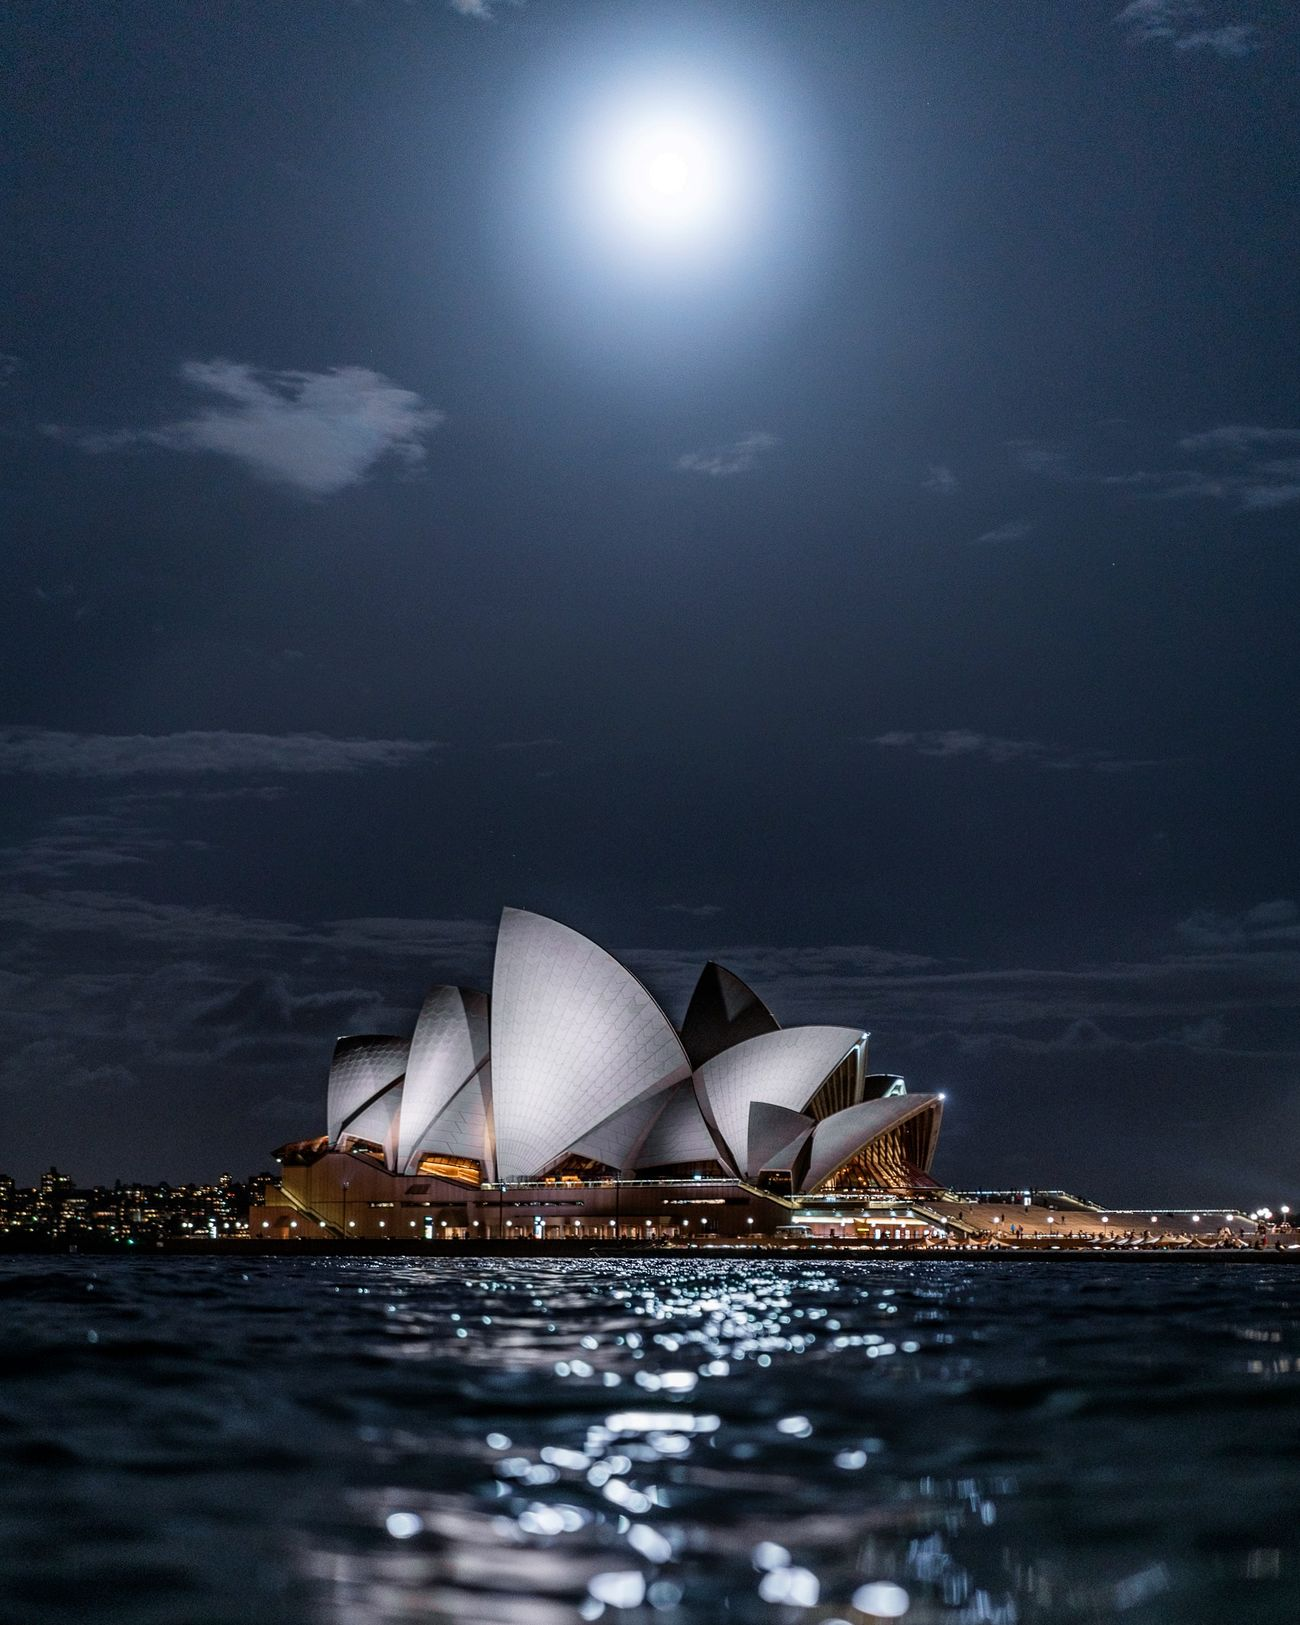 Supermoon Supermoon Supermoon2016 BestofEyeEm EyeEm Best Shots Sydneyoperahouse Sydney, Australia